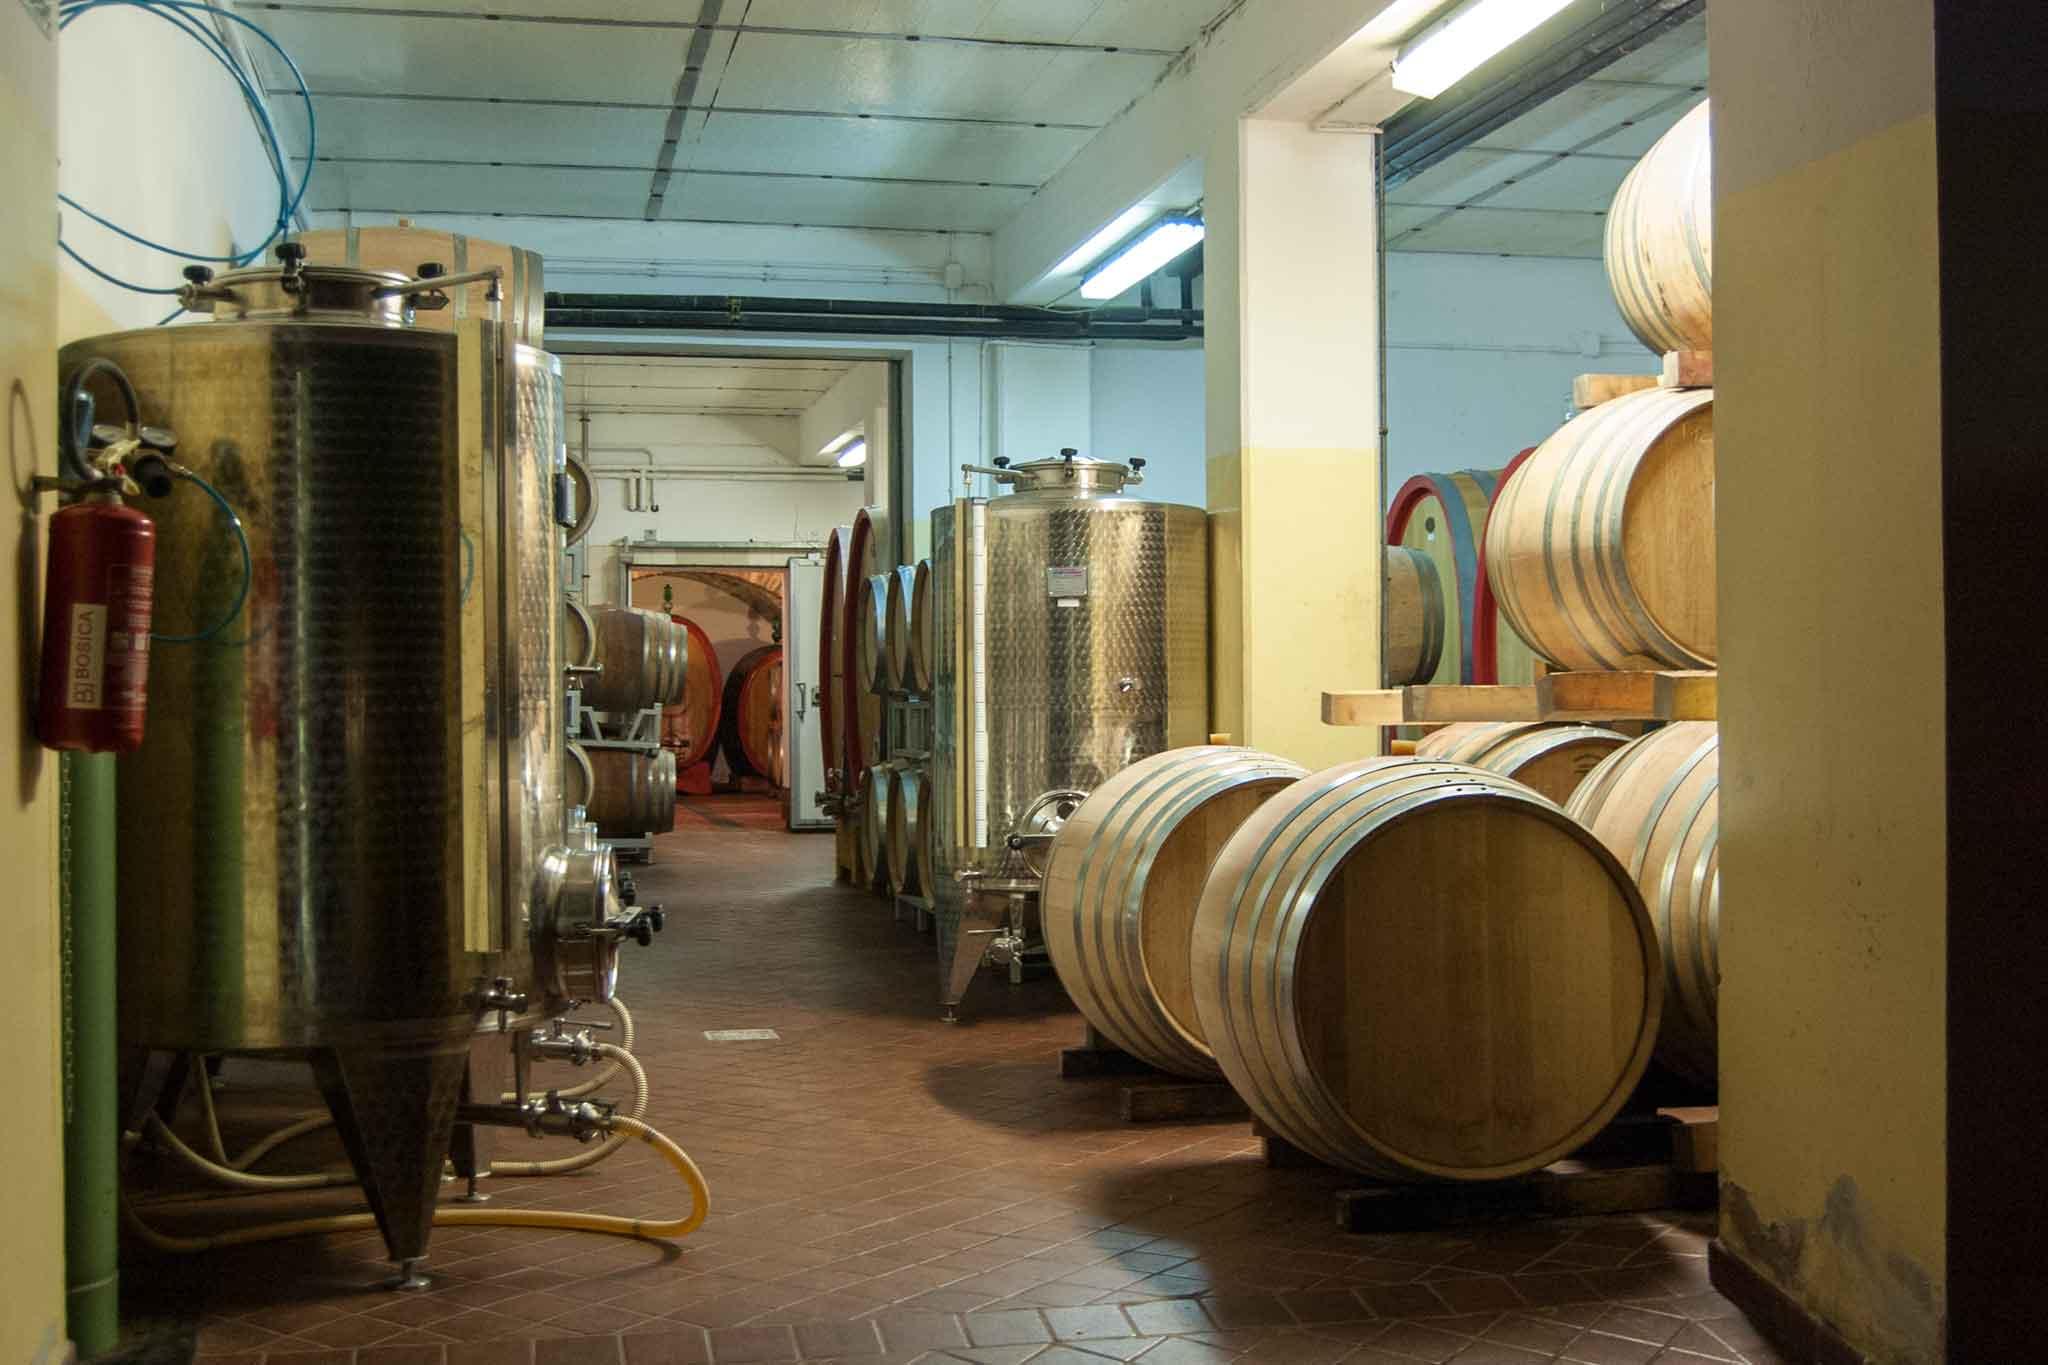 miglior vino in barrique